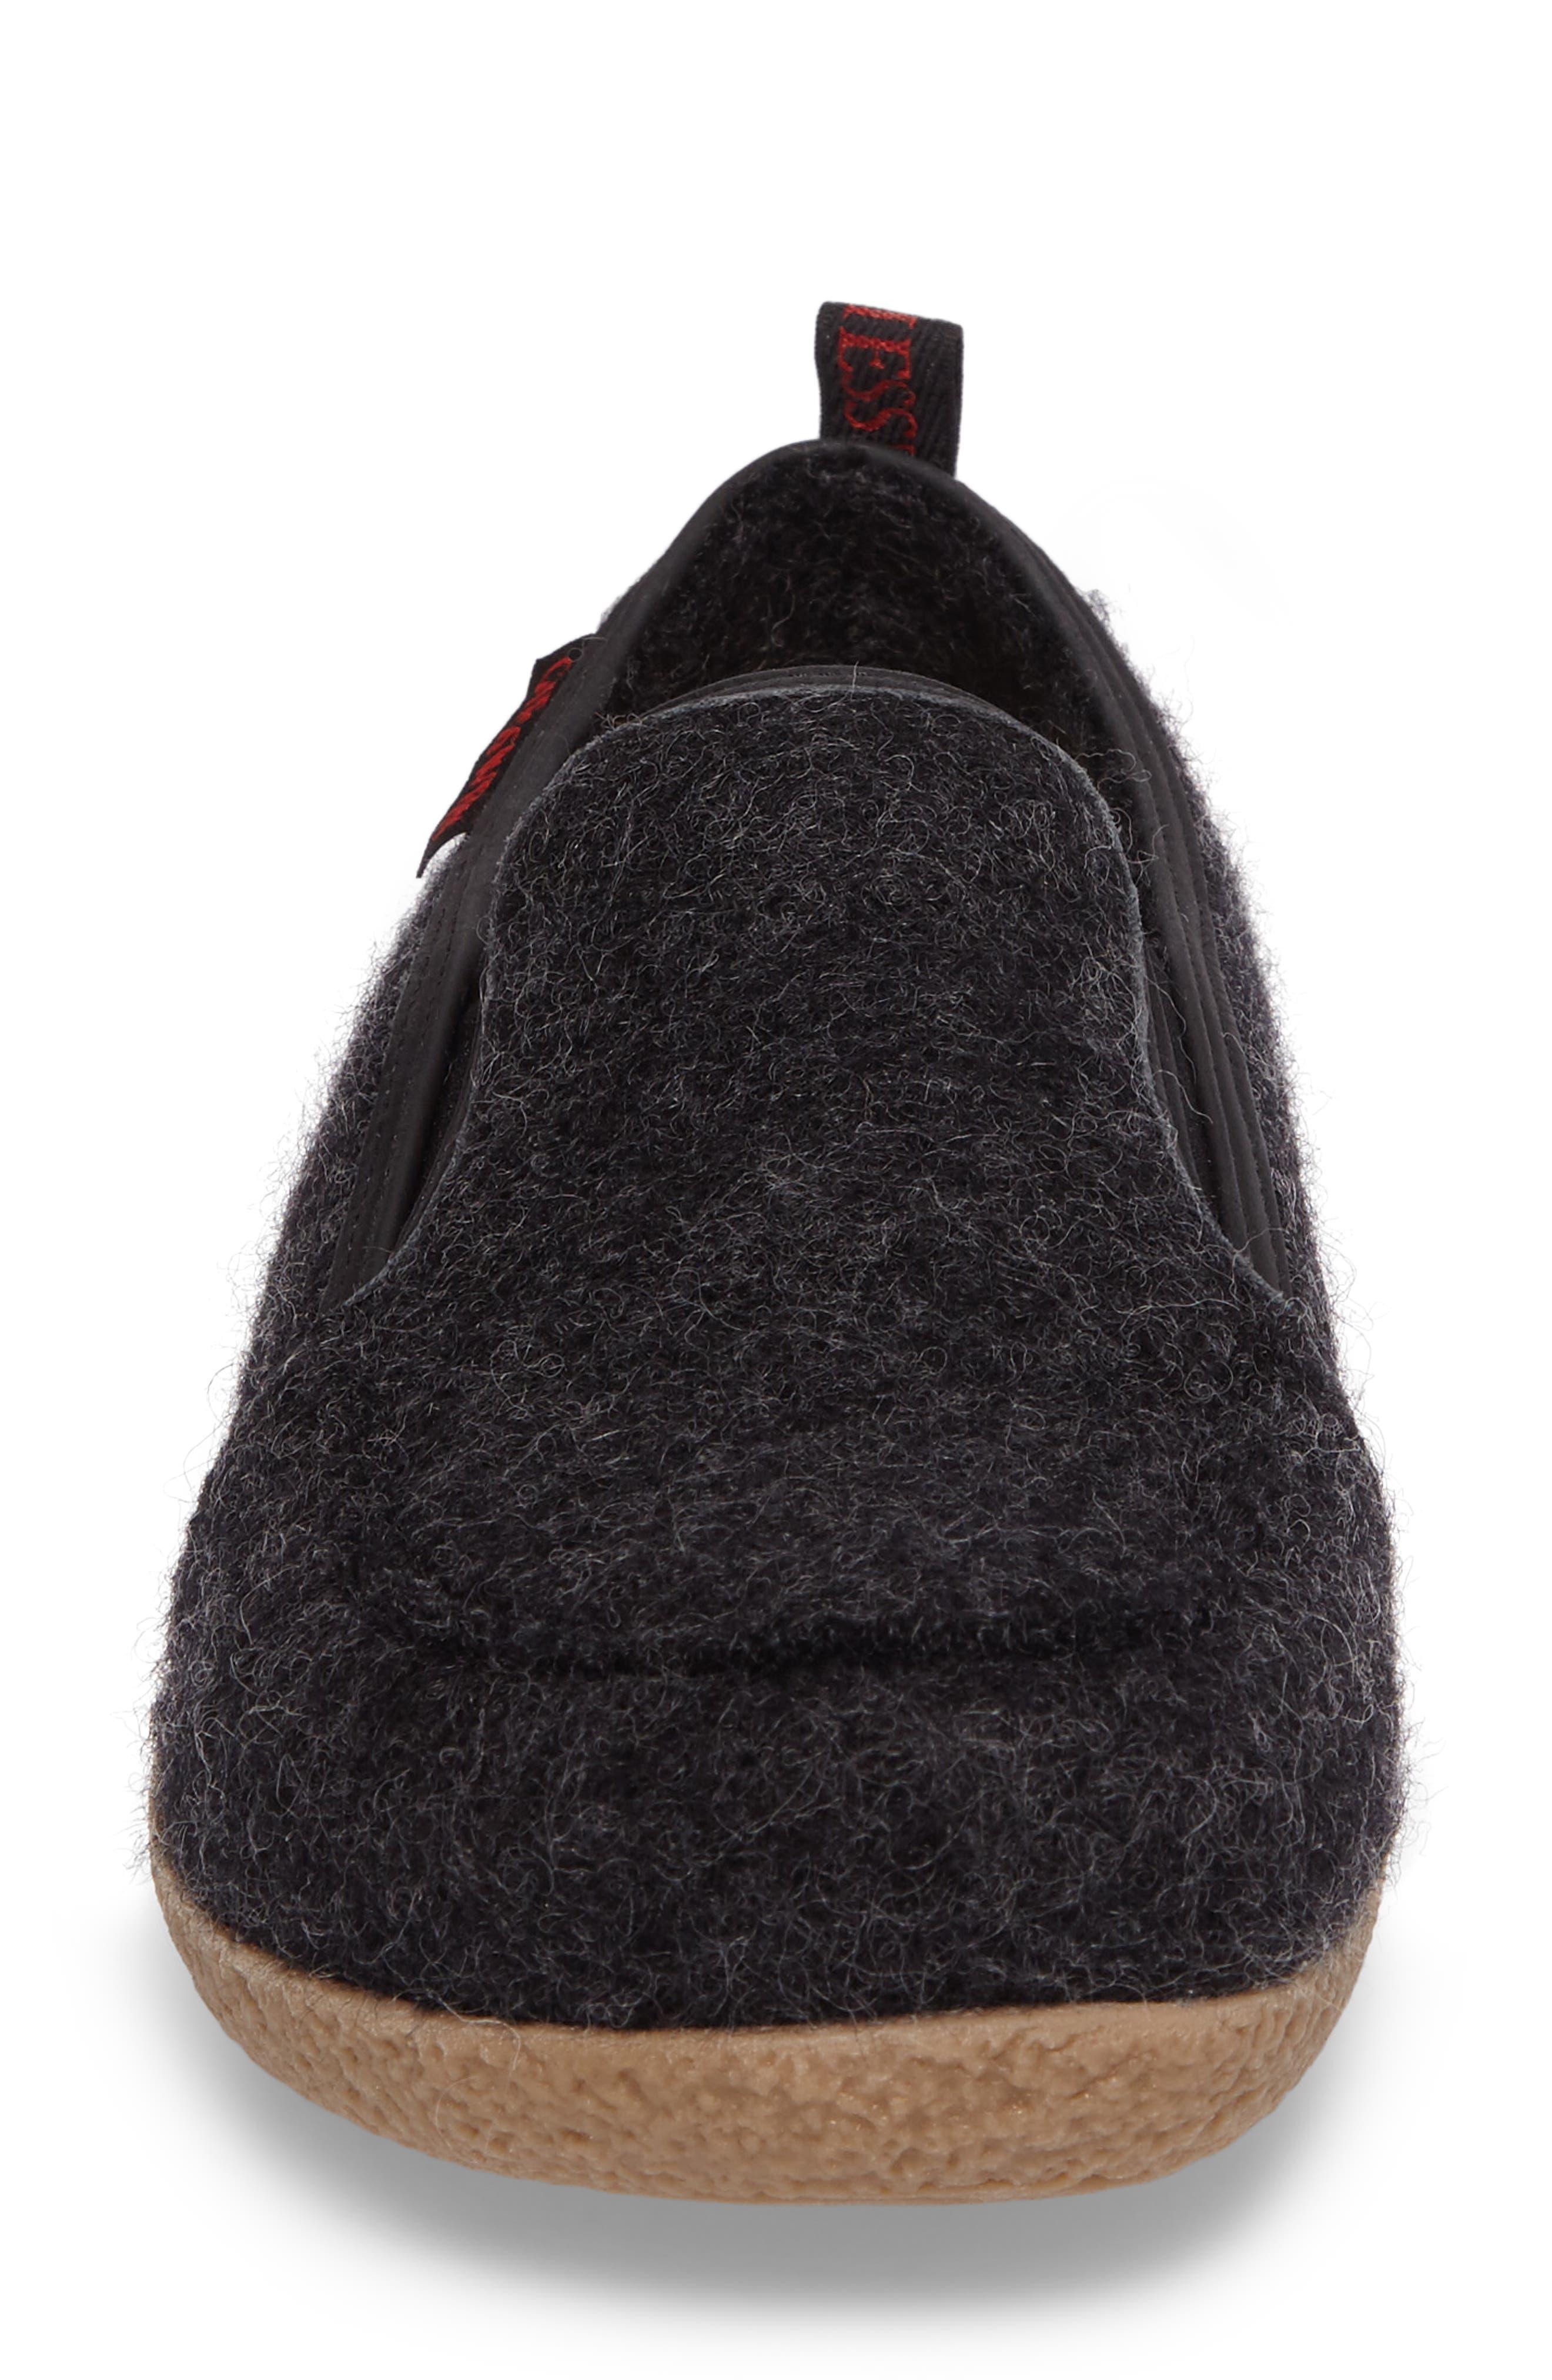 Innsbruck Boiled Wool Slipper,                             Alternate thumbnail 4, color,                             CHARCOAL WOOL